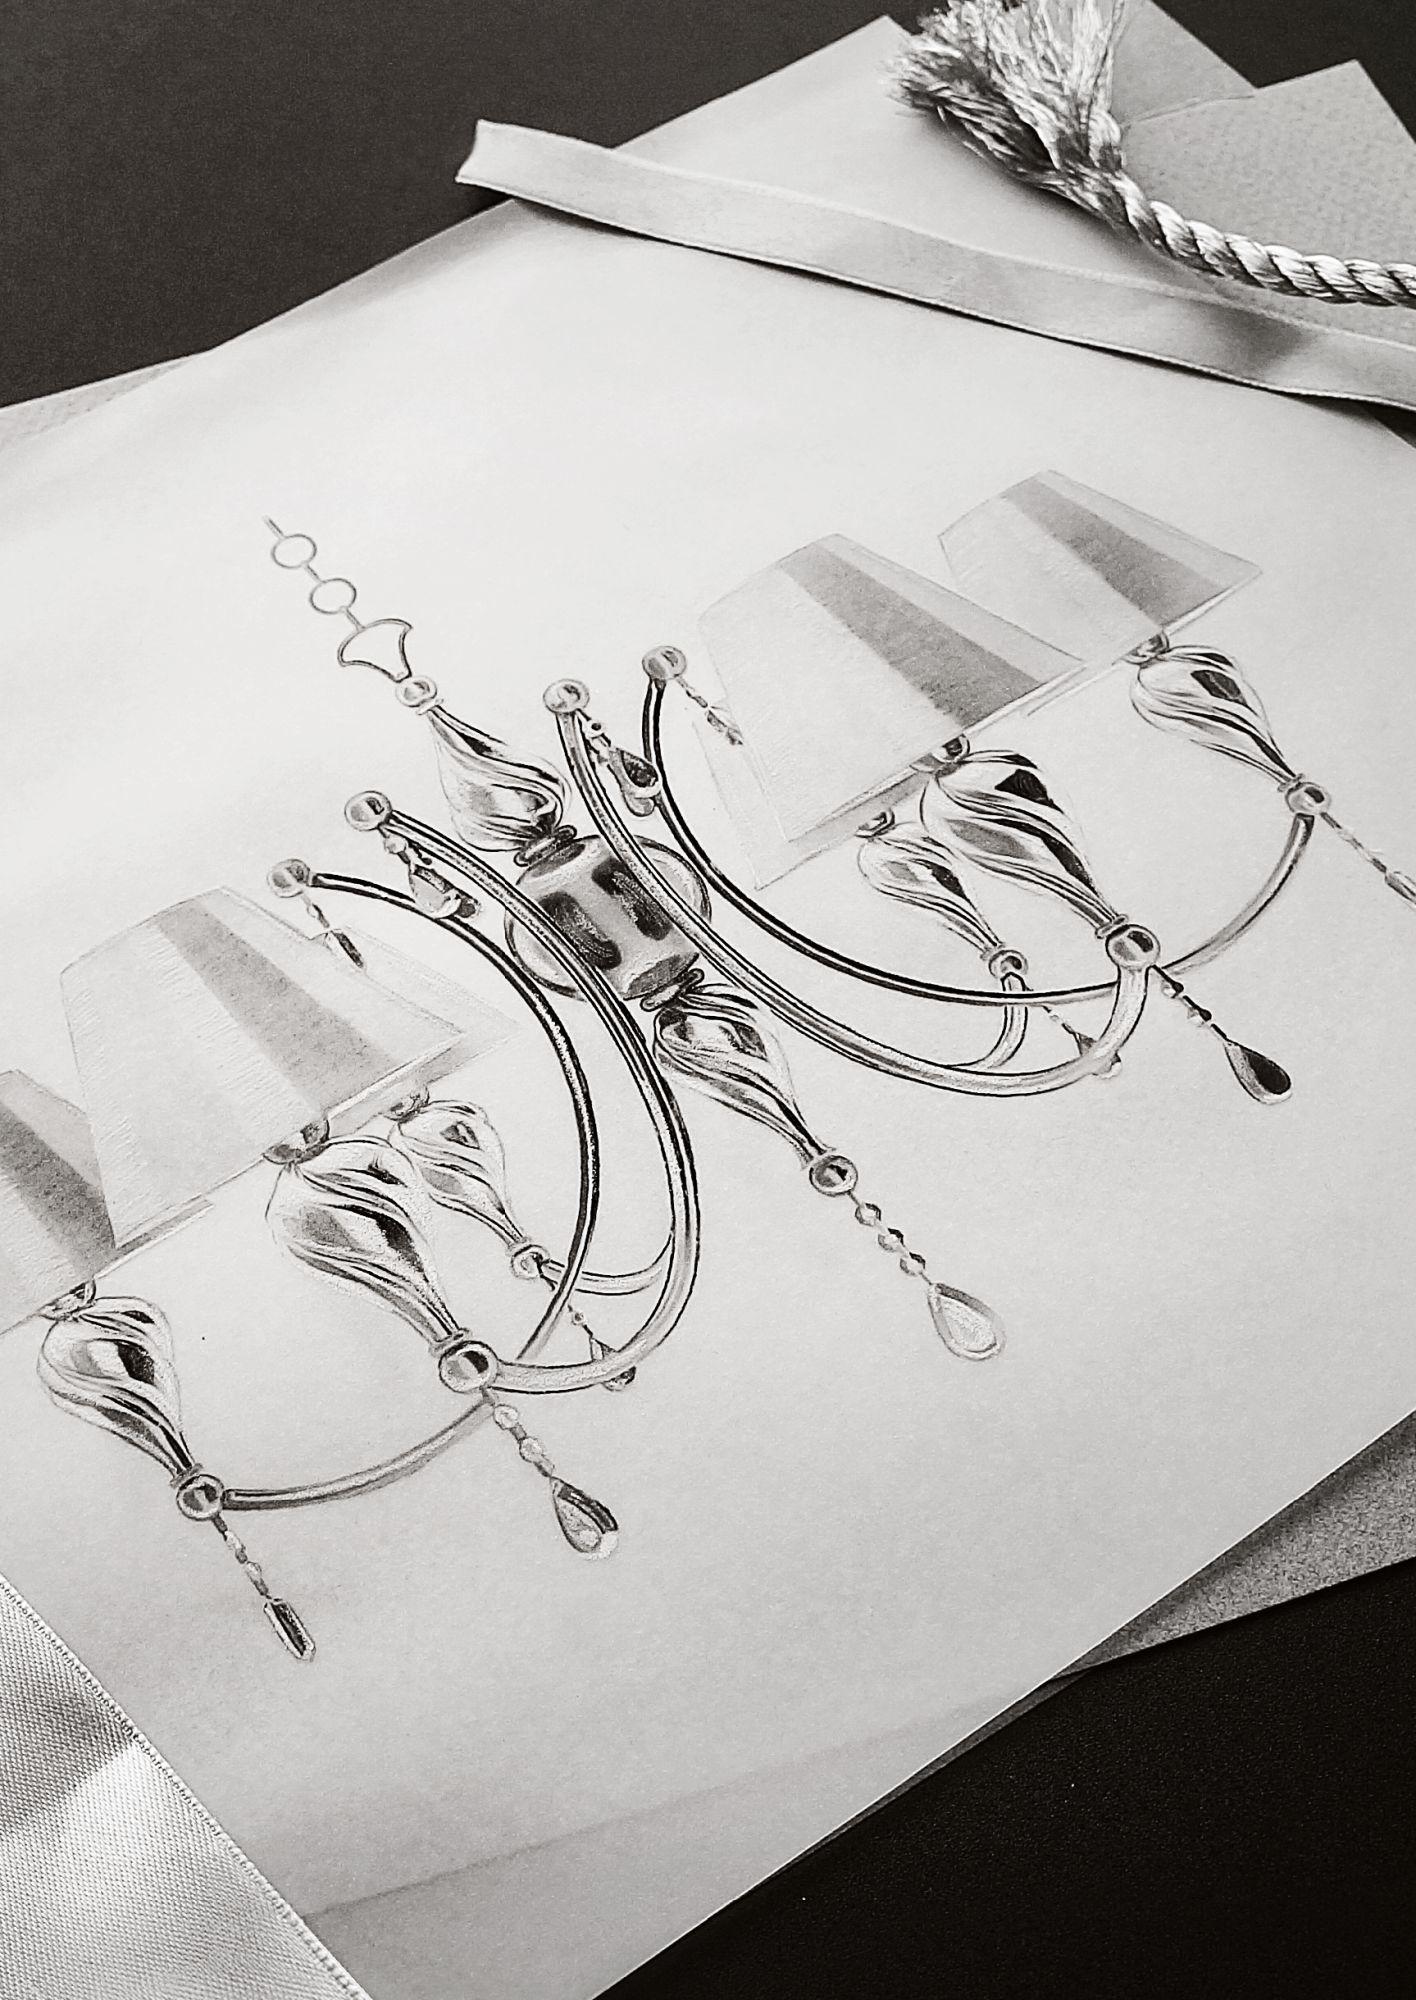 Подвесная люстра Maytoni Royal Classic Murano RC855-PL-08-R (arm855-08-r), 8xE14x40W, бронза, коньячный, бежевый, металл со стеклом, текстиль, хрусталь - фото 4